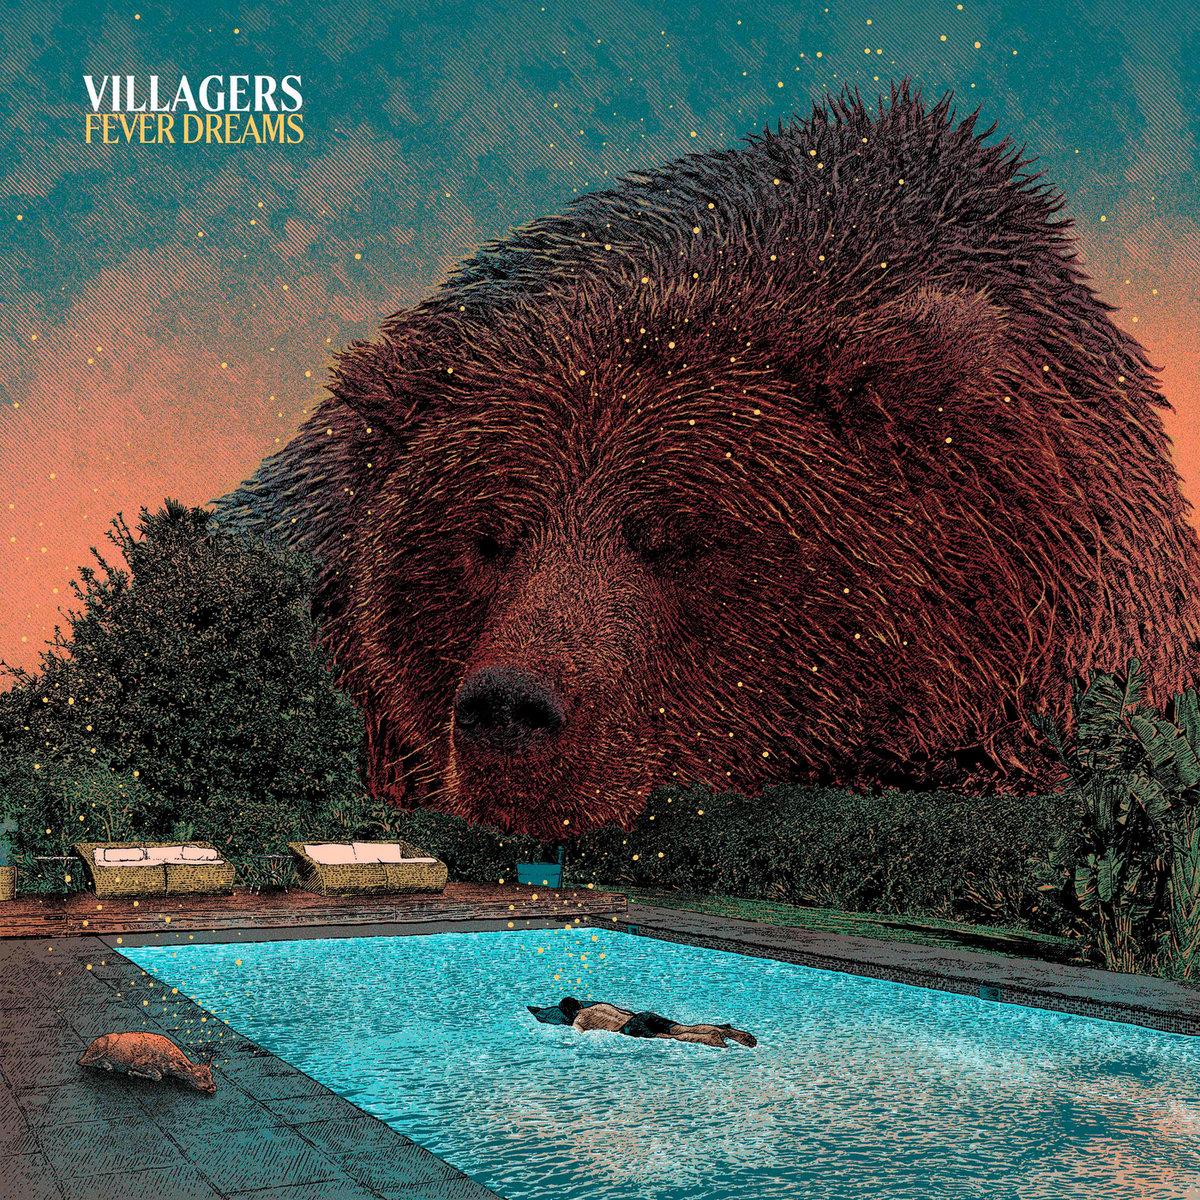 Fever Dreams | Villagers